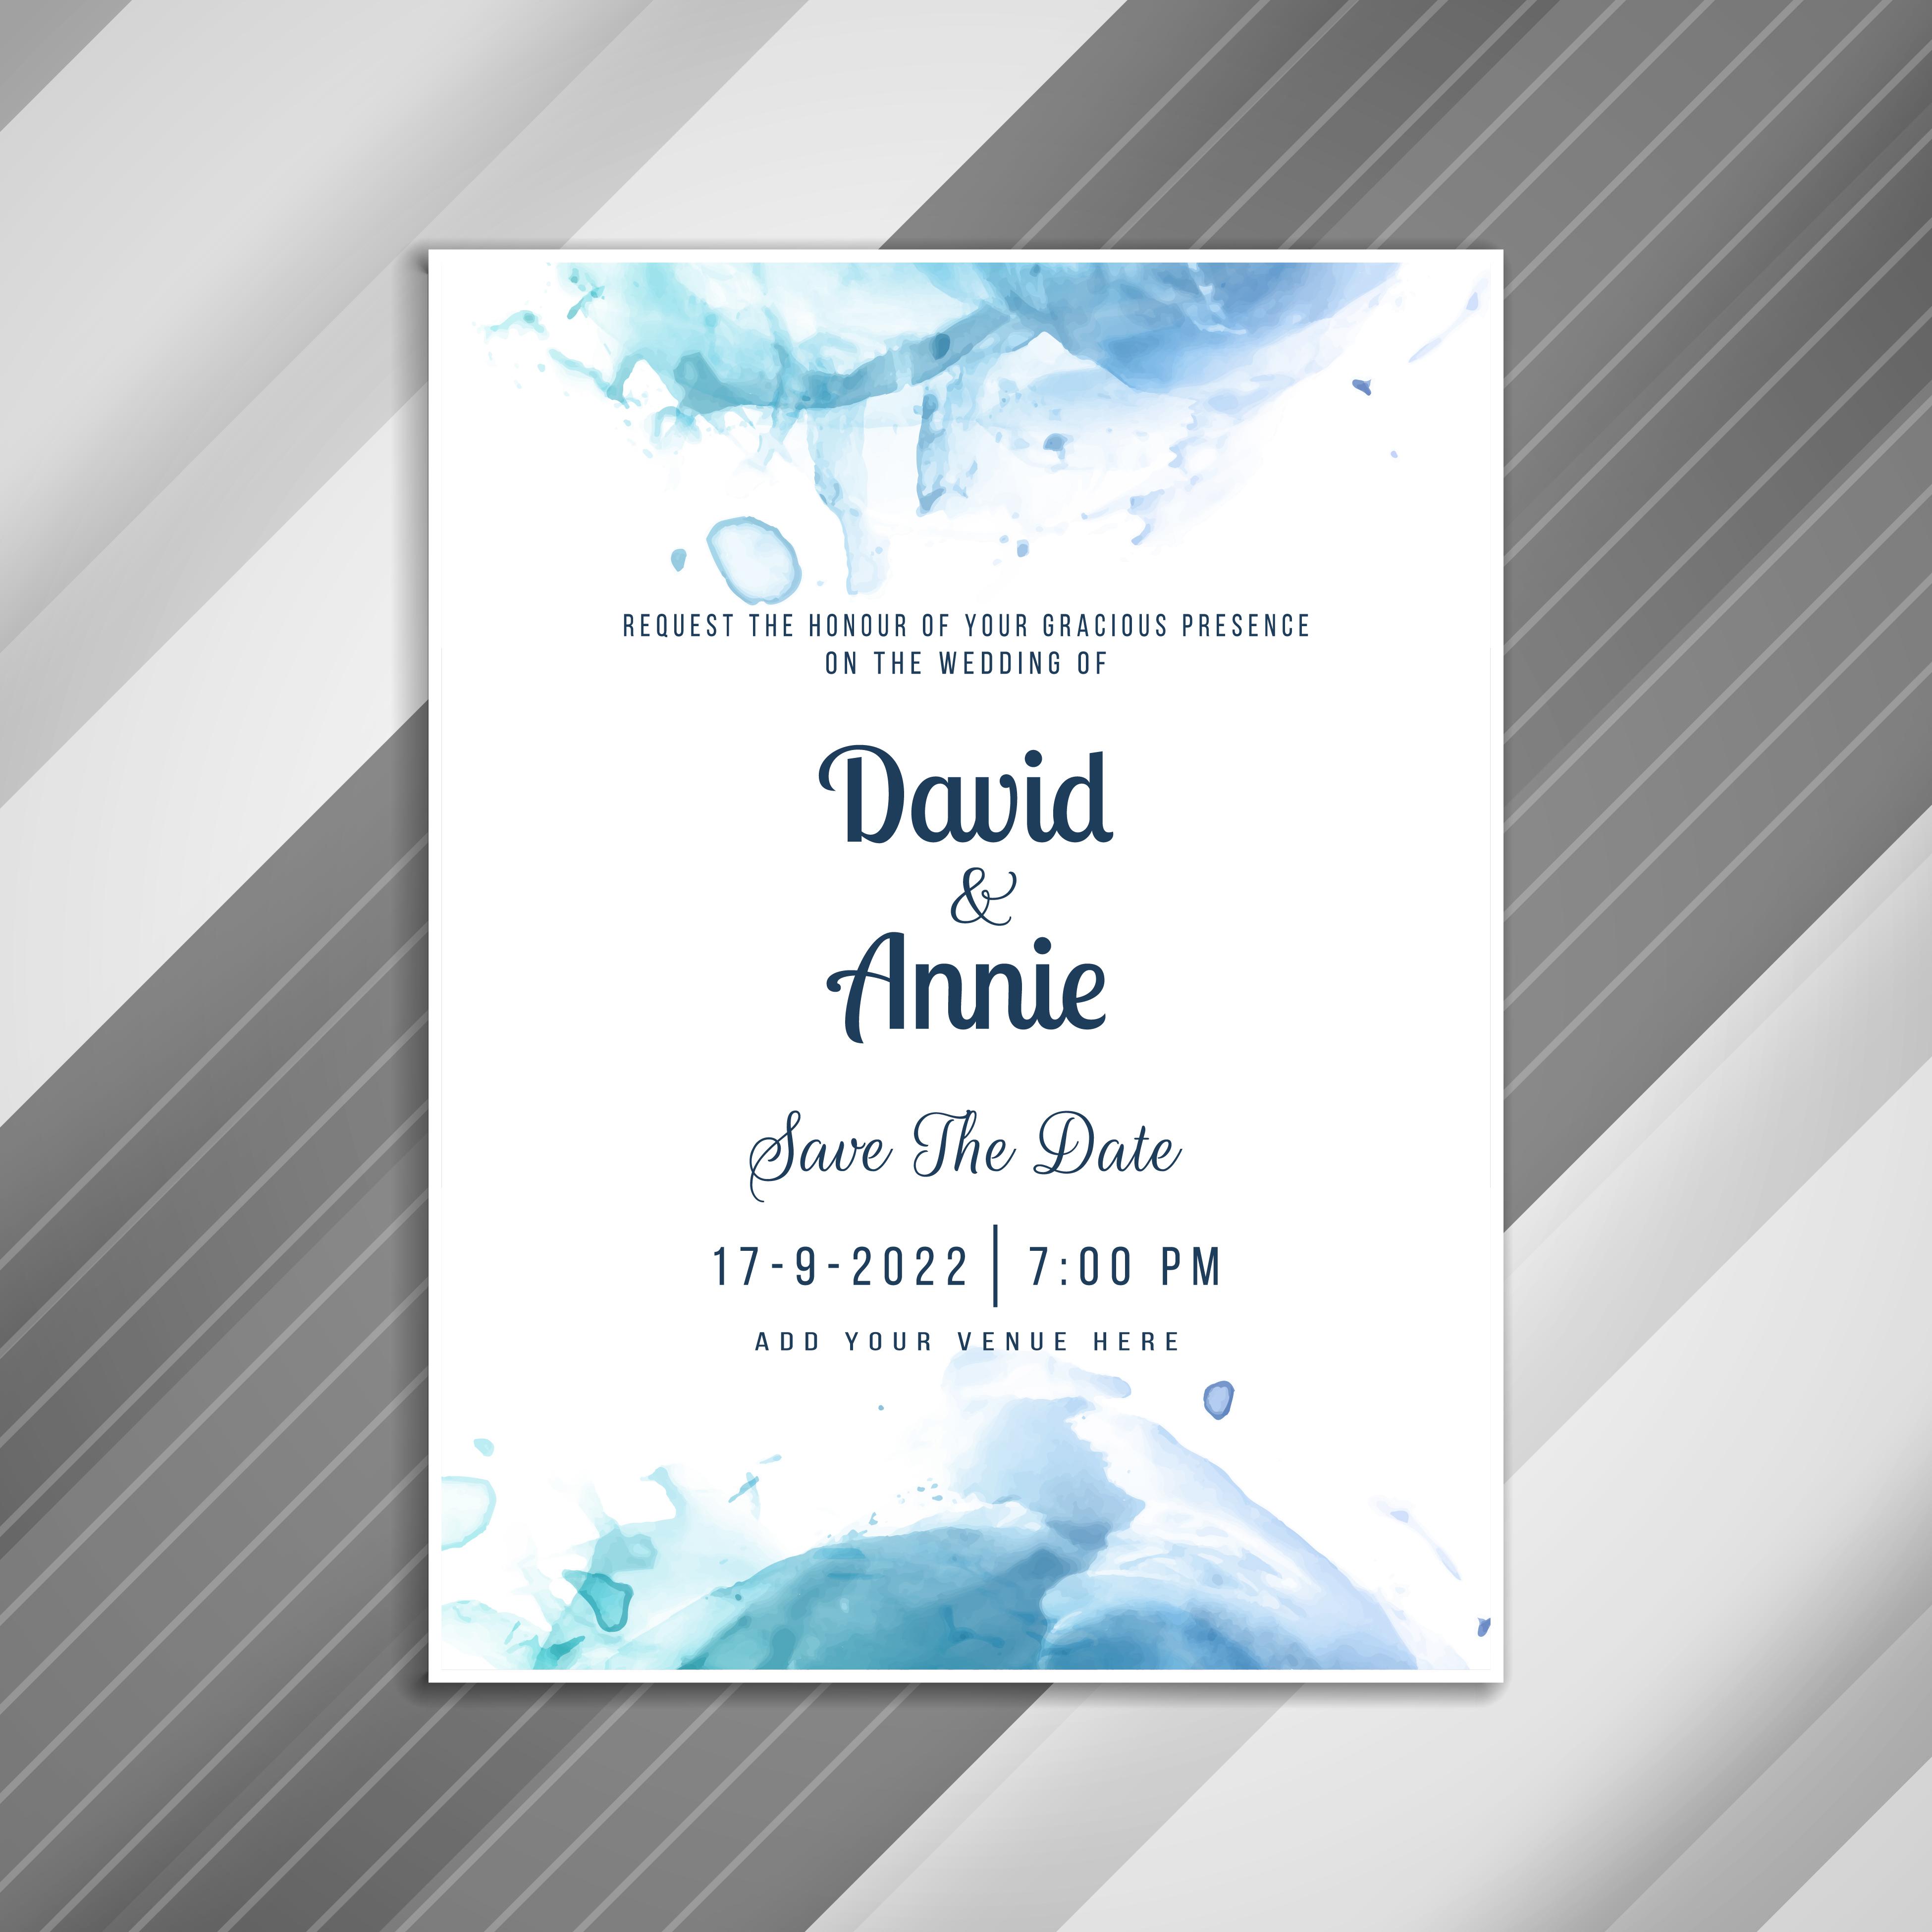 abstract stylish wedding invitation card template 254434